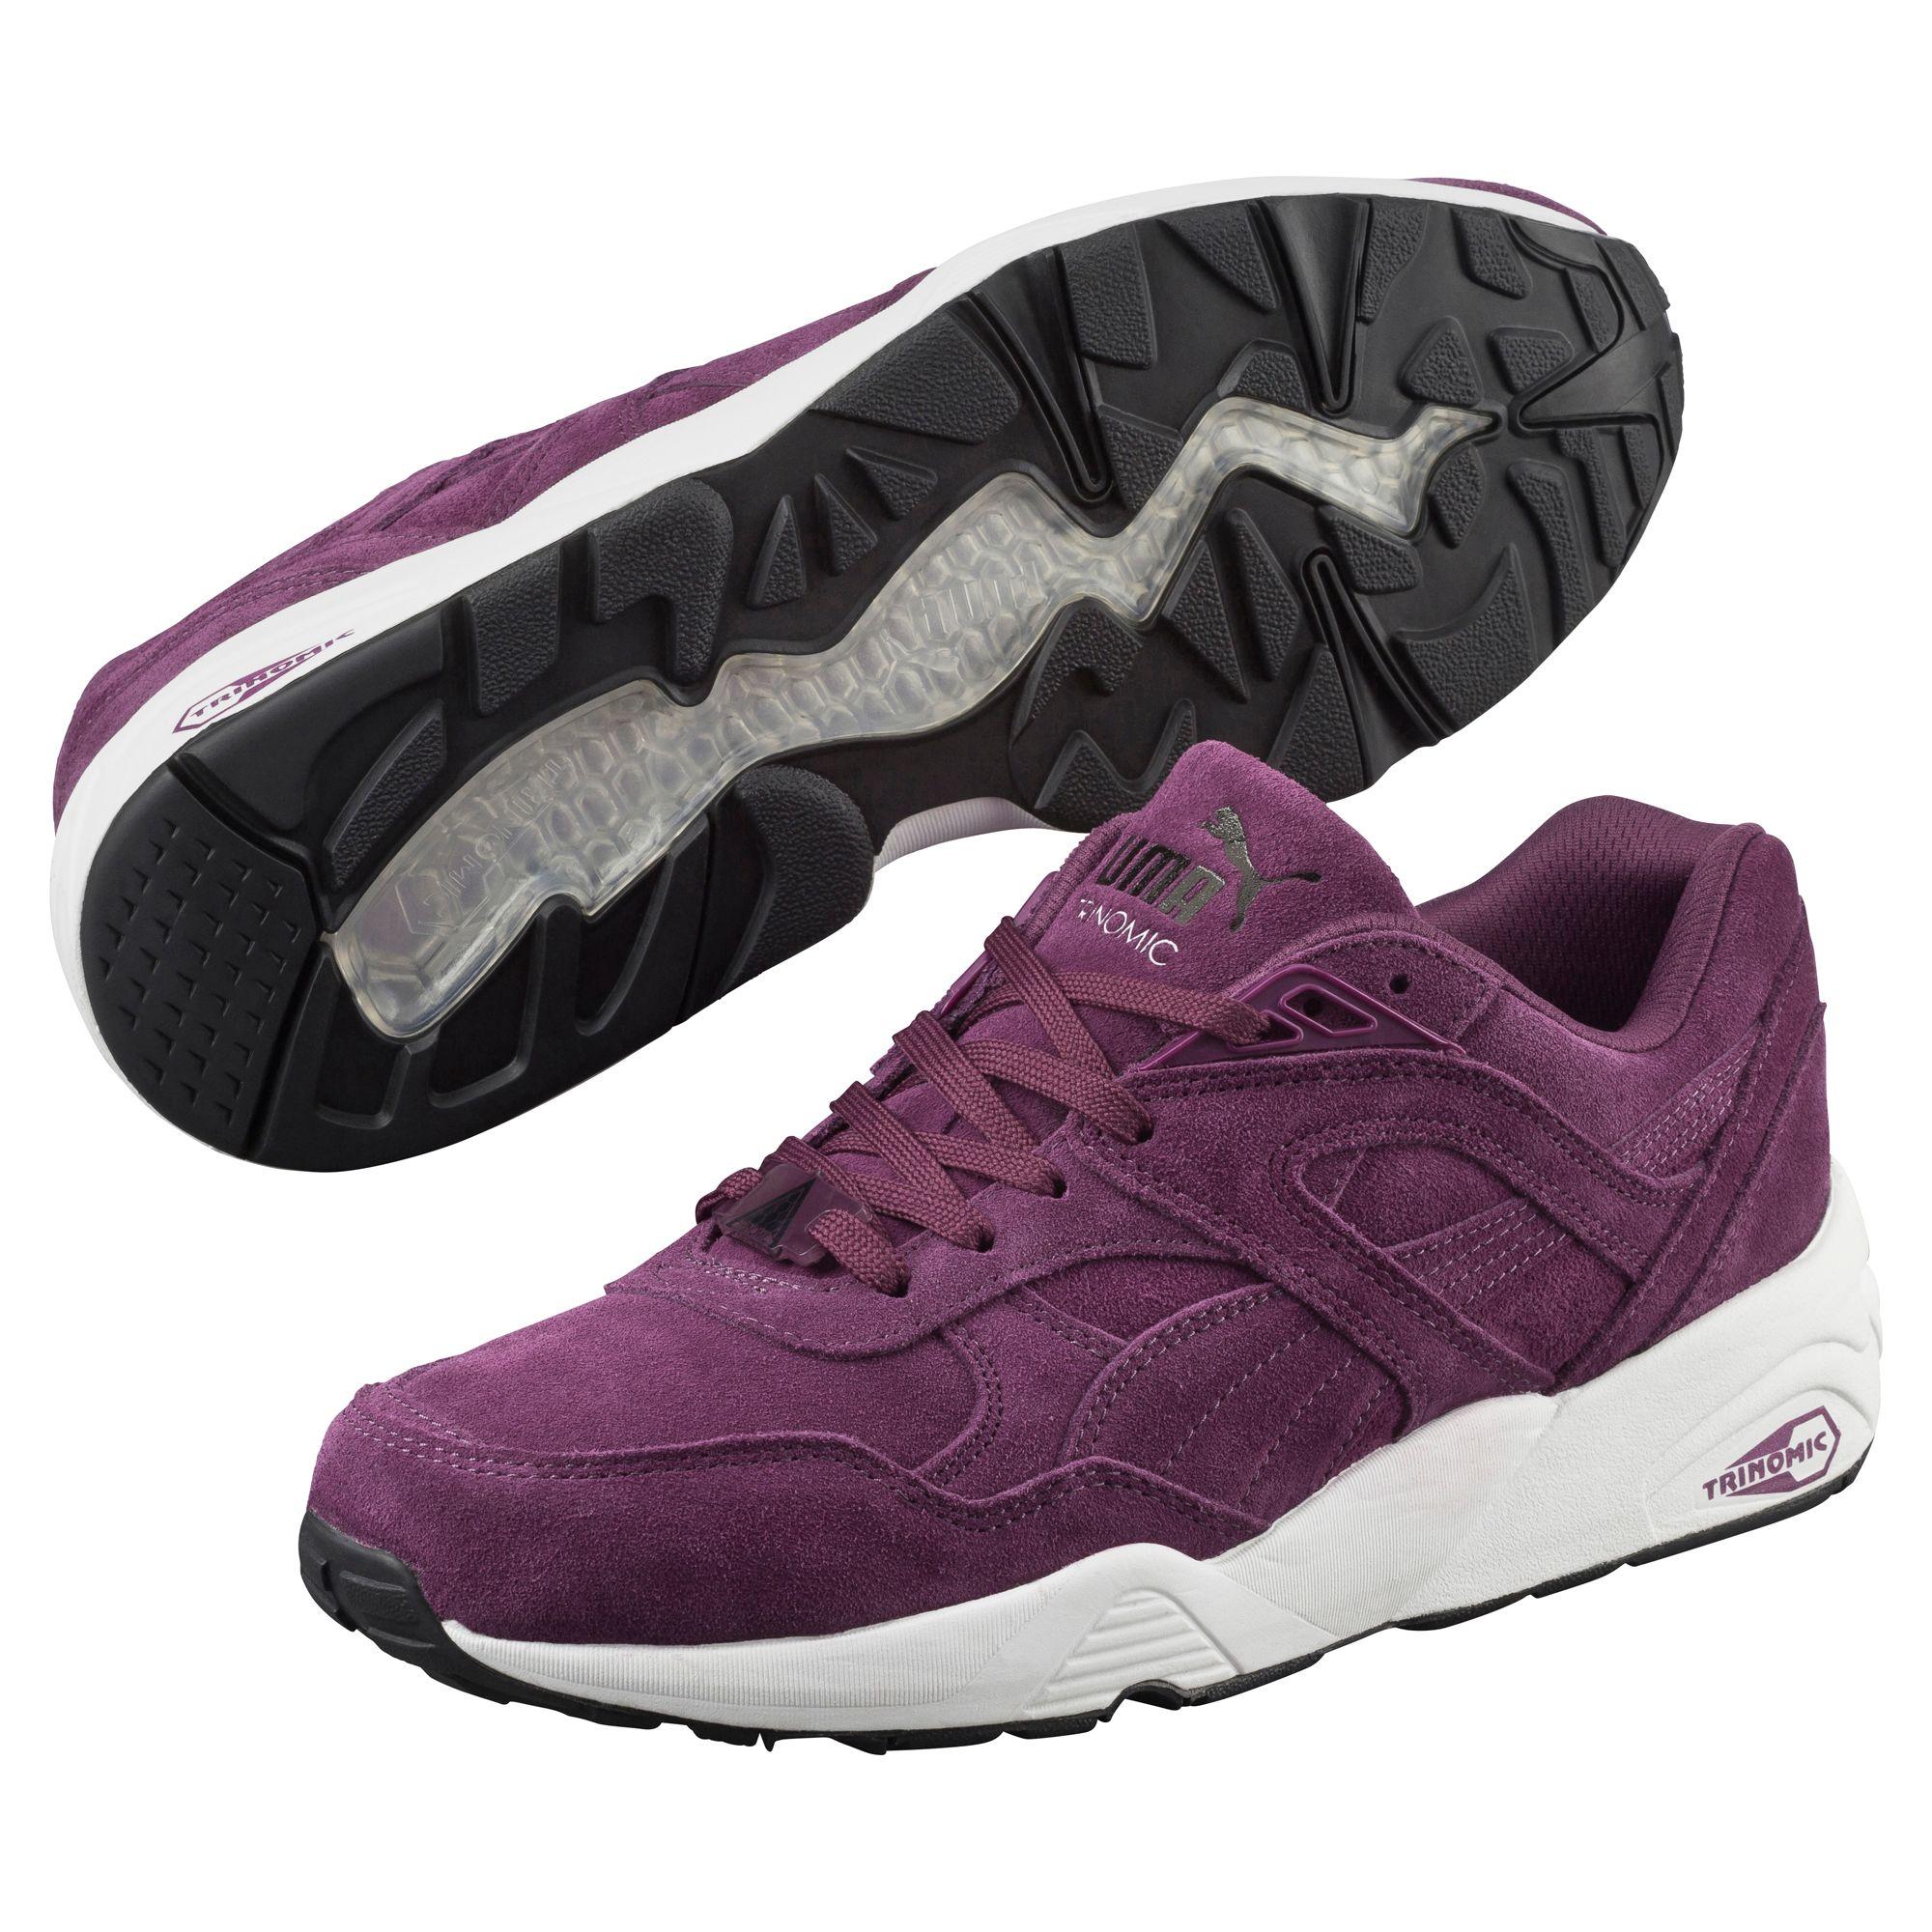 PUMA-Trinomic-R698-All-over-Suede-Trainers-Footwear-